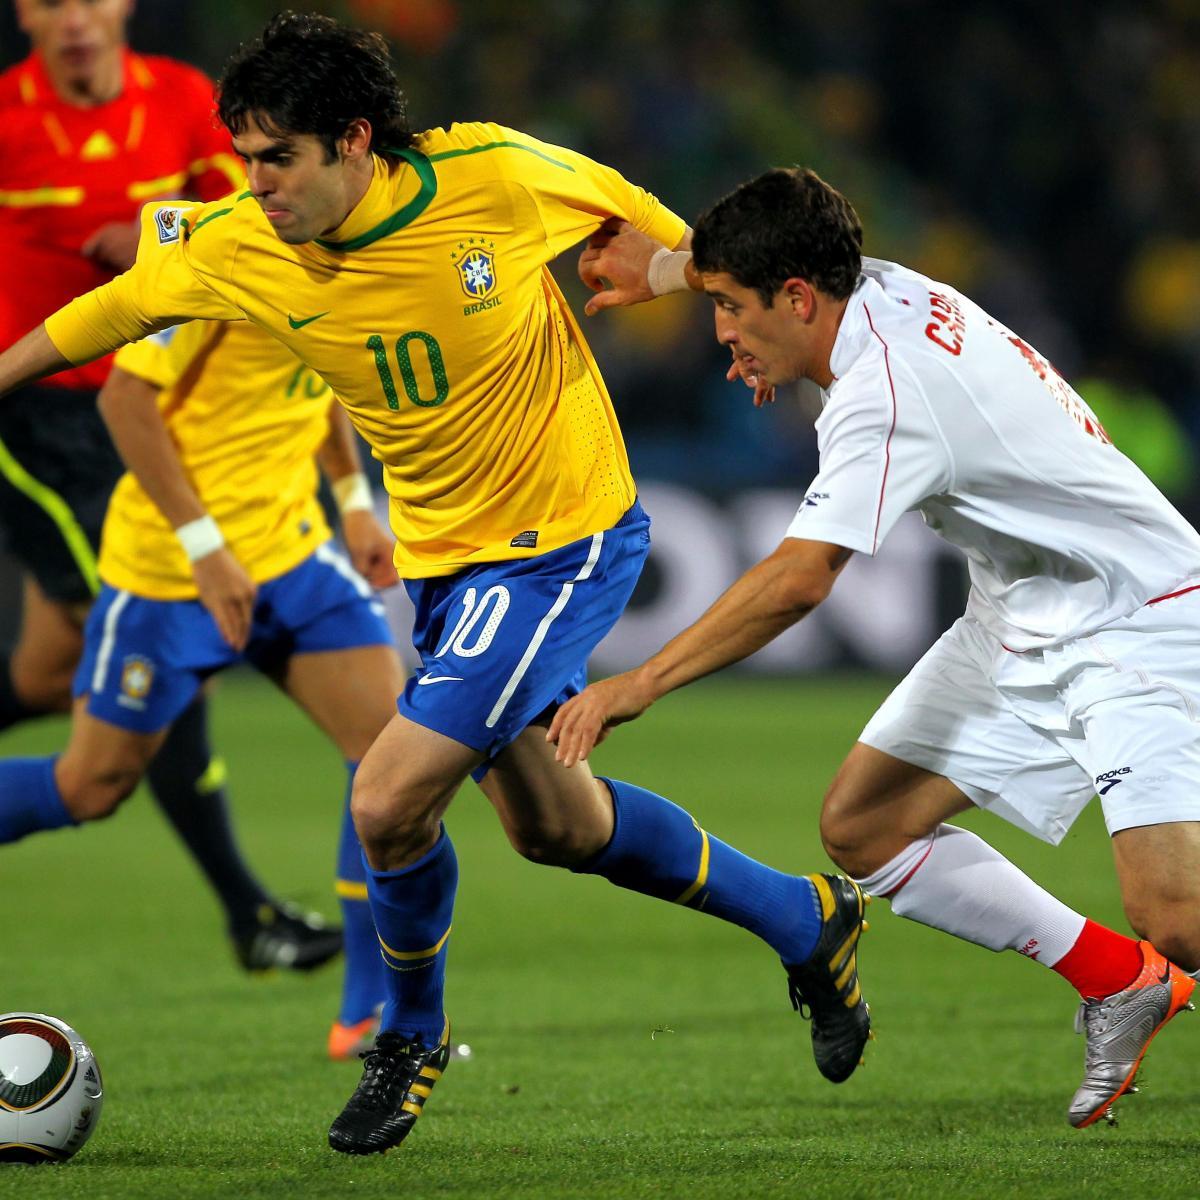 Kaka Brazil: Are World Cup Hopes In Tatters For Ronaldinho And Kaka